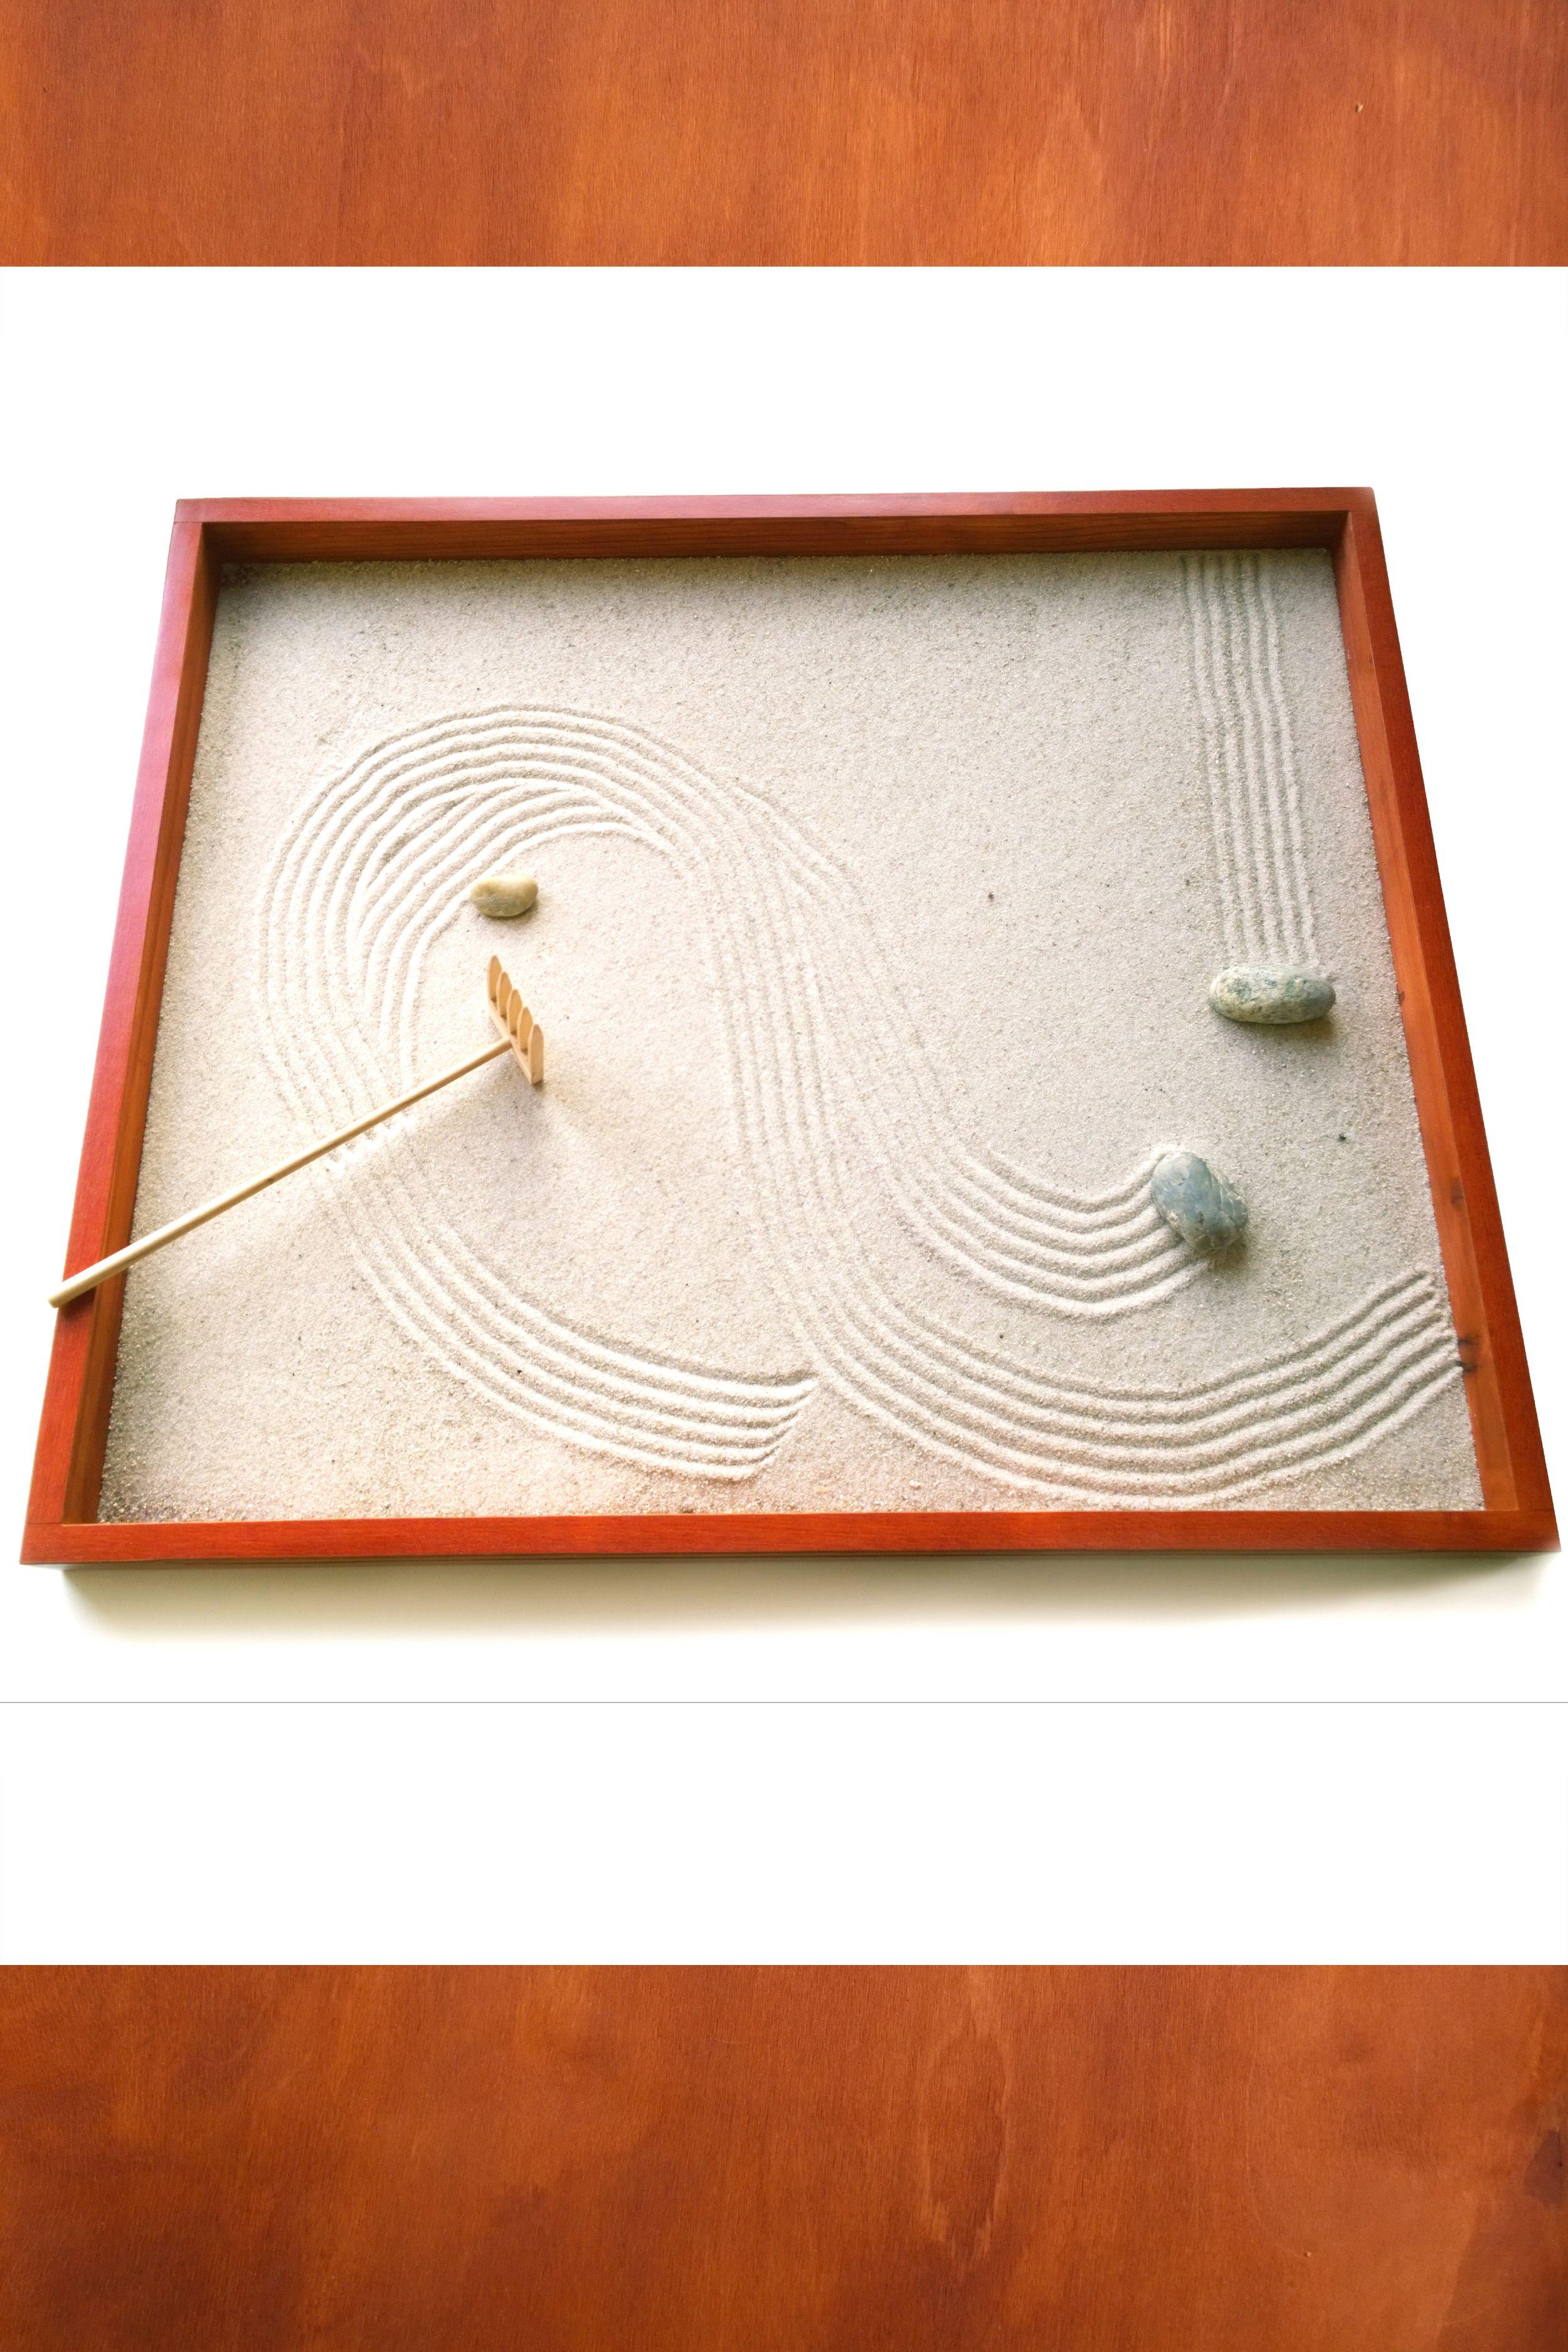 Natural Wood Handmade Zen Garden Perfect Decorative Iteam For Home Or Office Rakes Stones And Sand Are Also Incl Zen Garden Mini Zen Garden Meditation Gifts